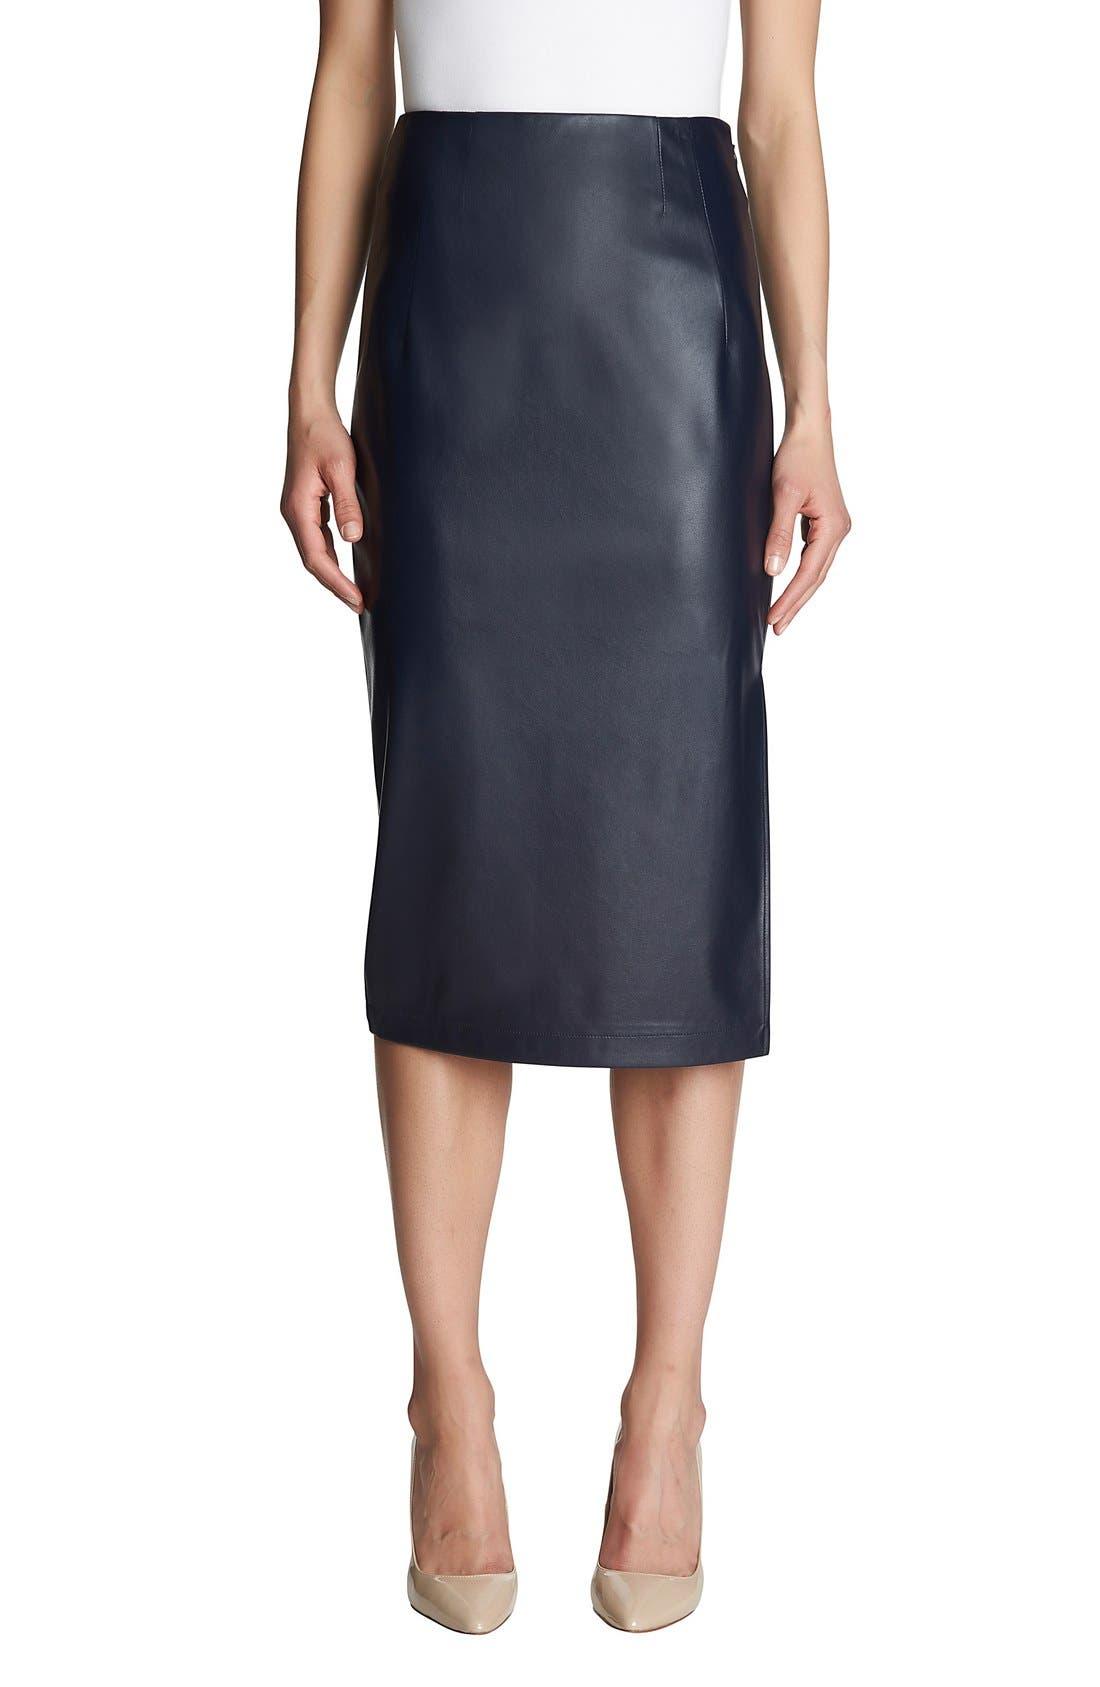 Alternate Image 1 Selected - 1.STATE Mixed Media Midi Pencil Skirt